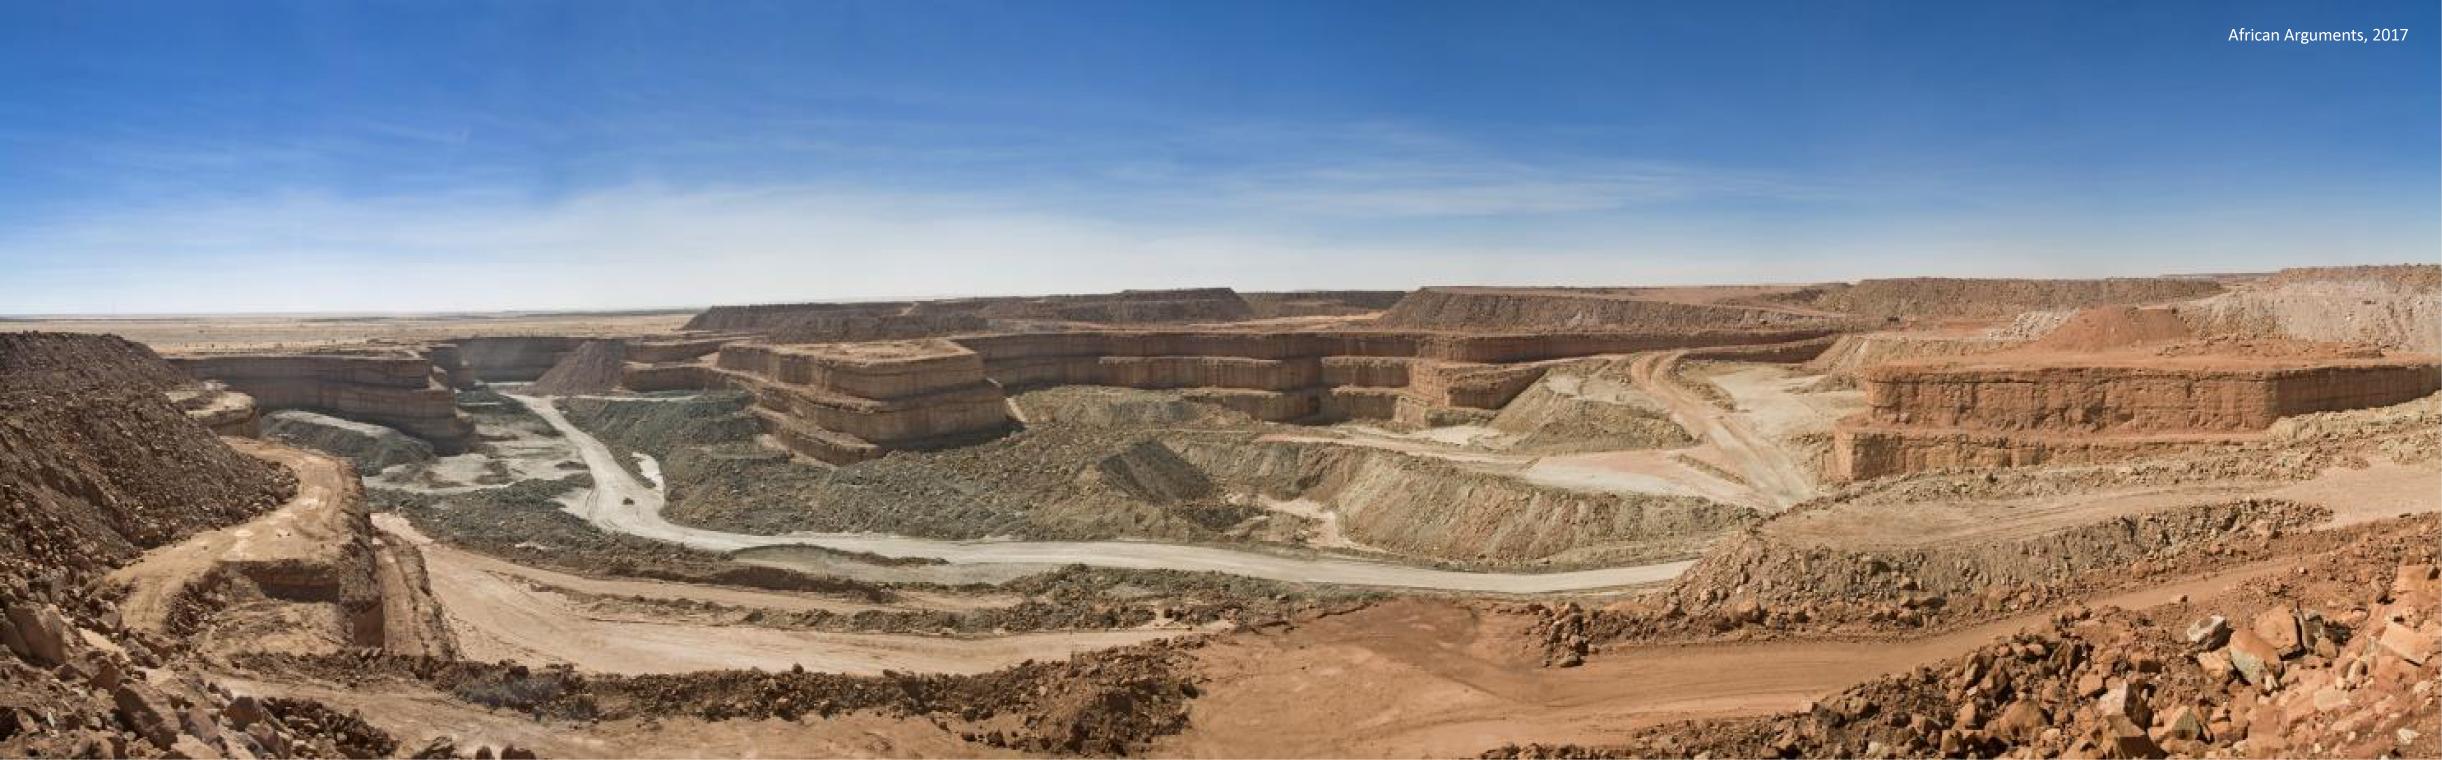 Orano runs this uranium mine (Somaïr) in Niger